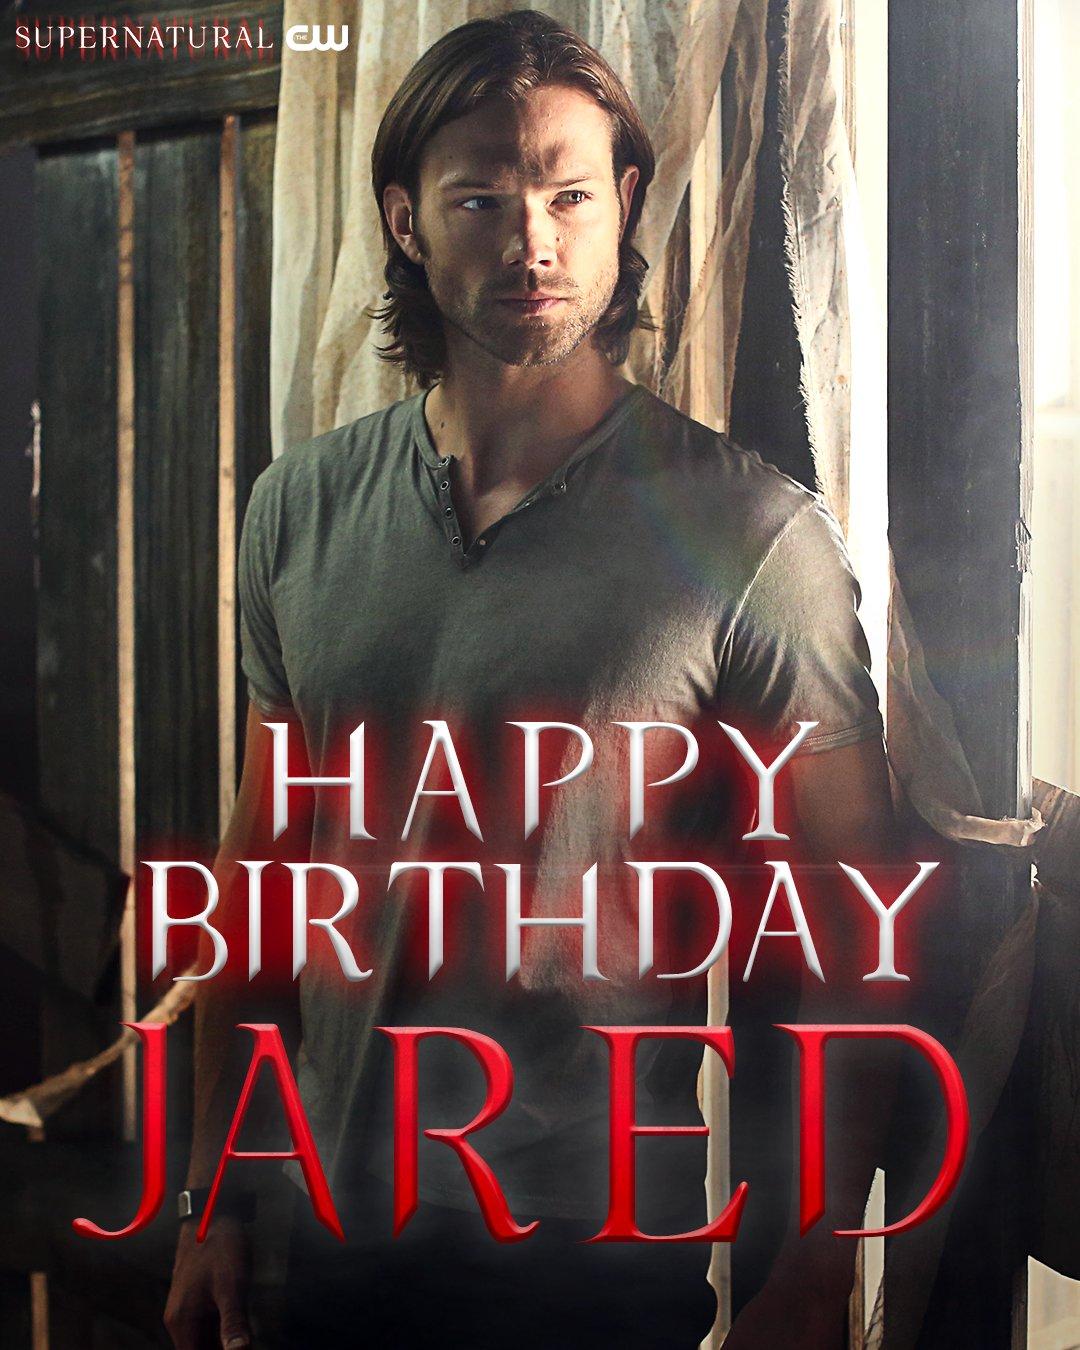 Happy Birthday, @jarpad ! #Supernatural https://t.co/Xjh6qWvOW6